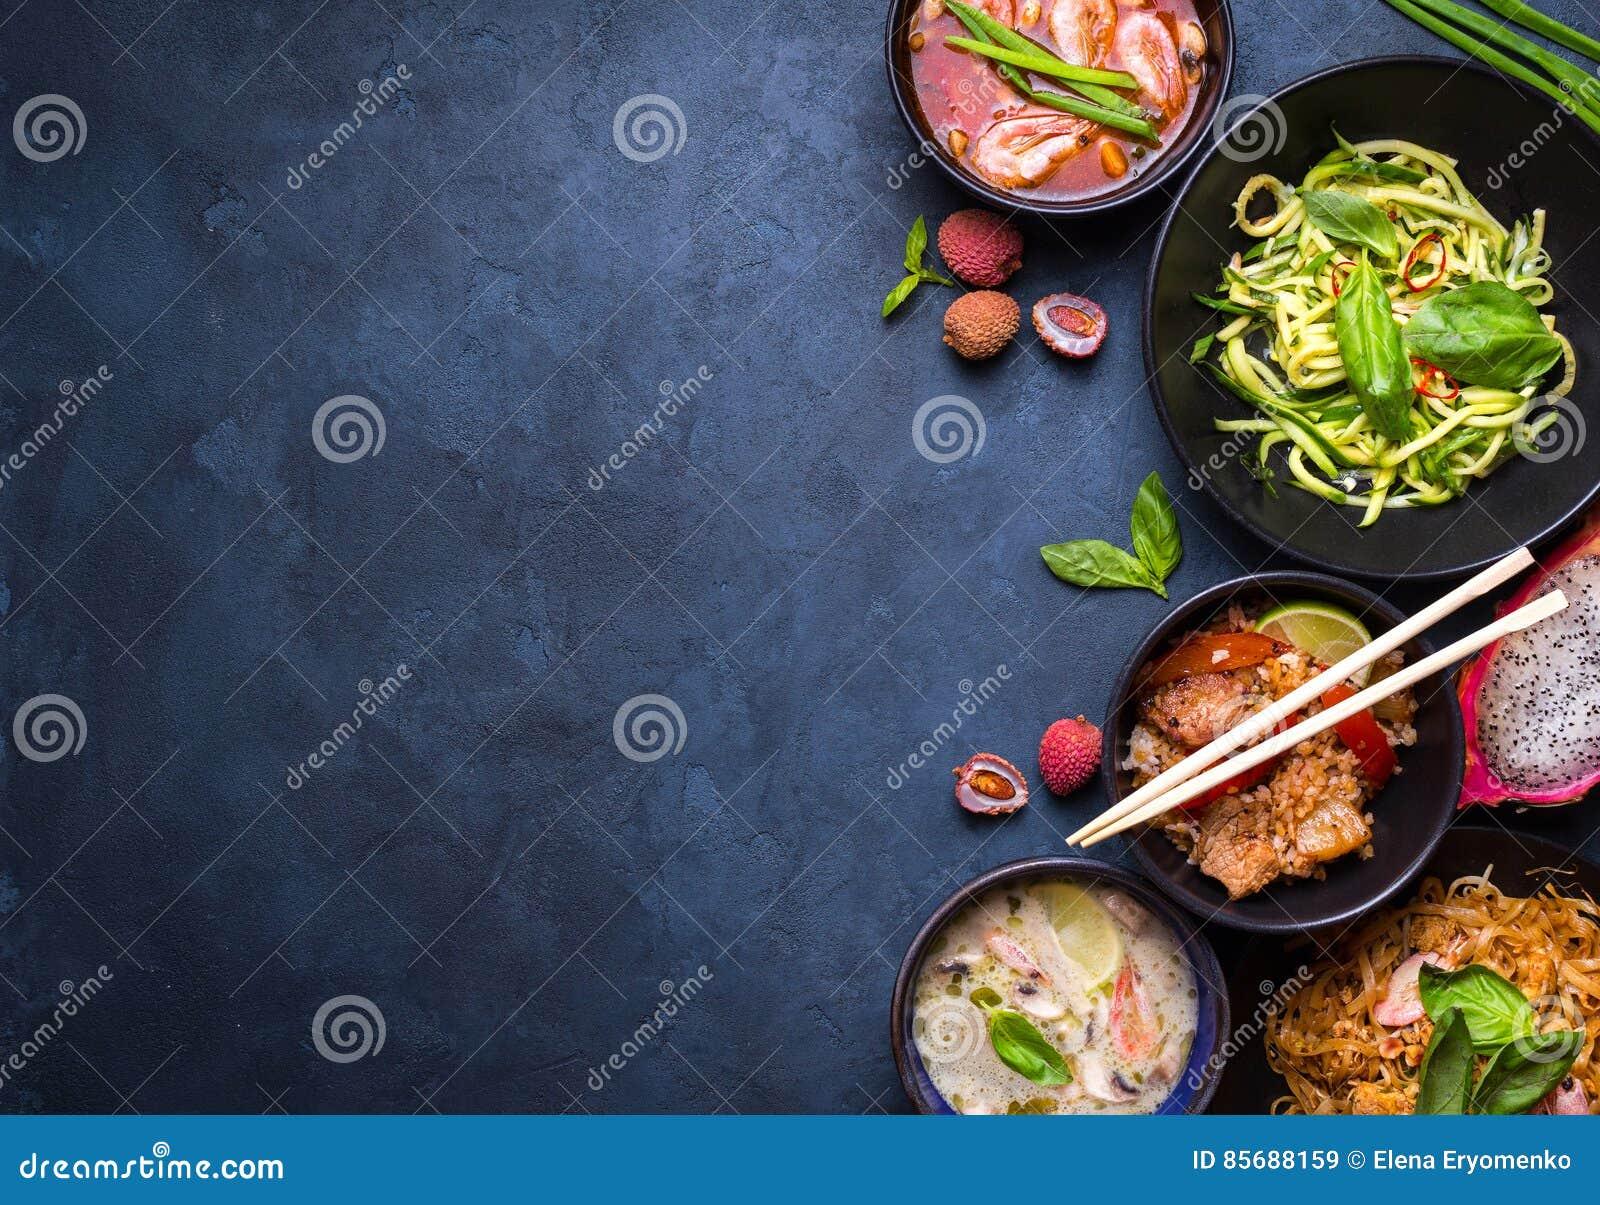 Thai food background stock image. Image of milk, background - 85688159